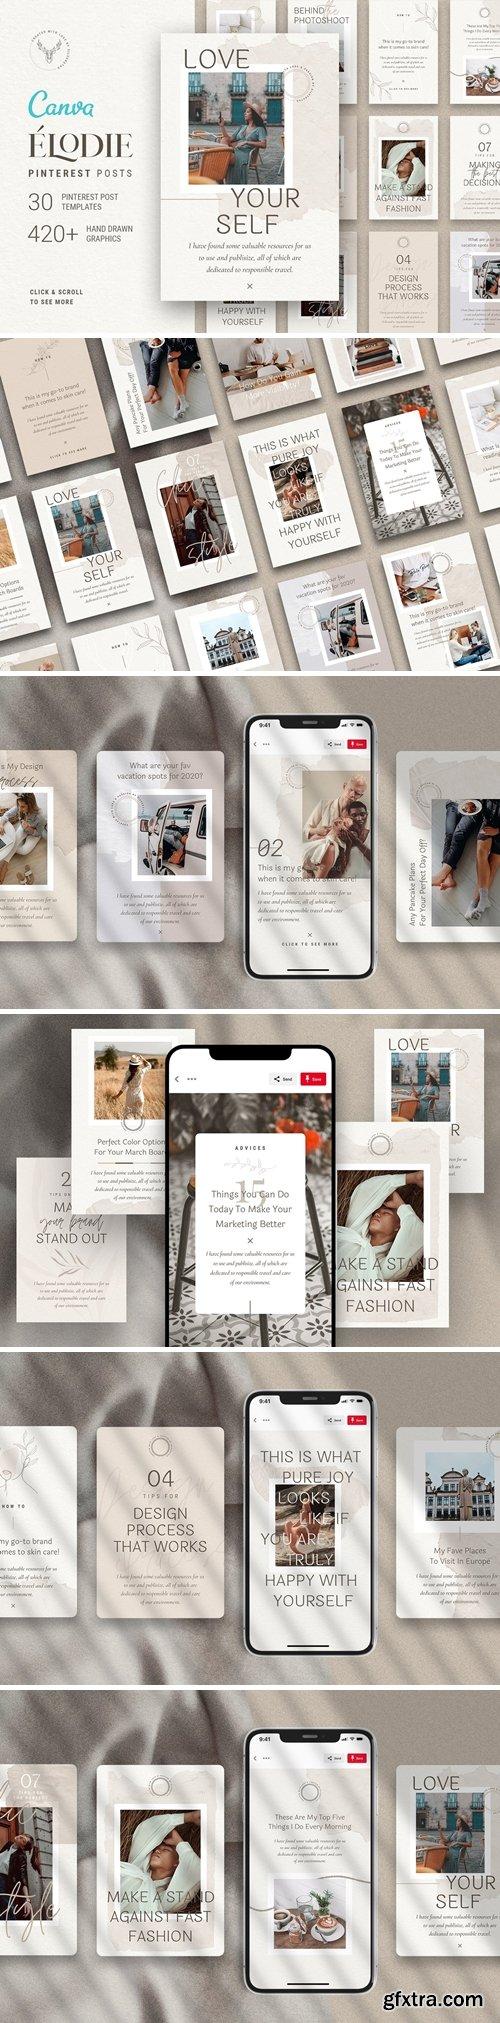 CreativeMarket - Elodie - Canva Pinterest Templates 4758292